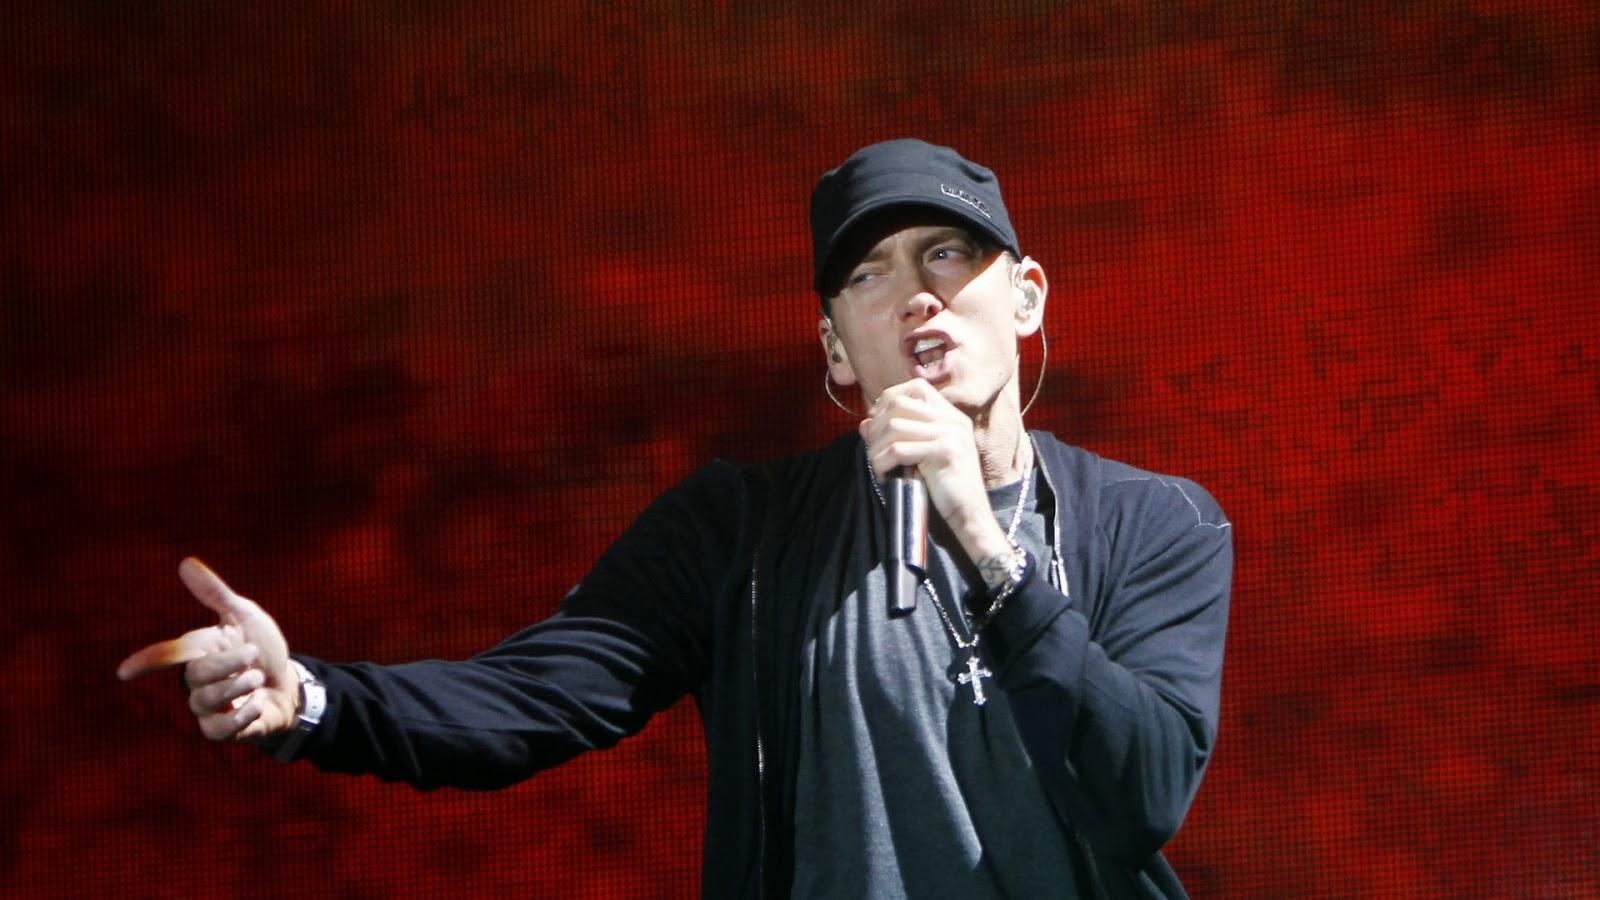 Eminem hd wallpapers hd wallpapers eminem hd wallpapers voltagebd Choice Image